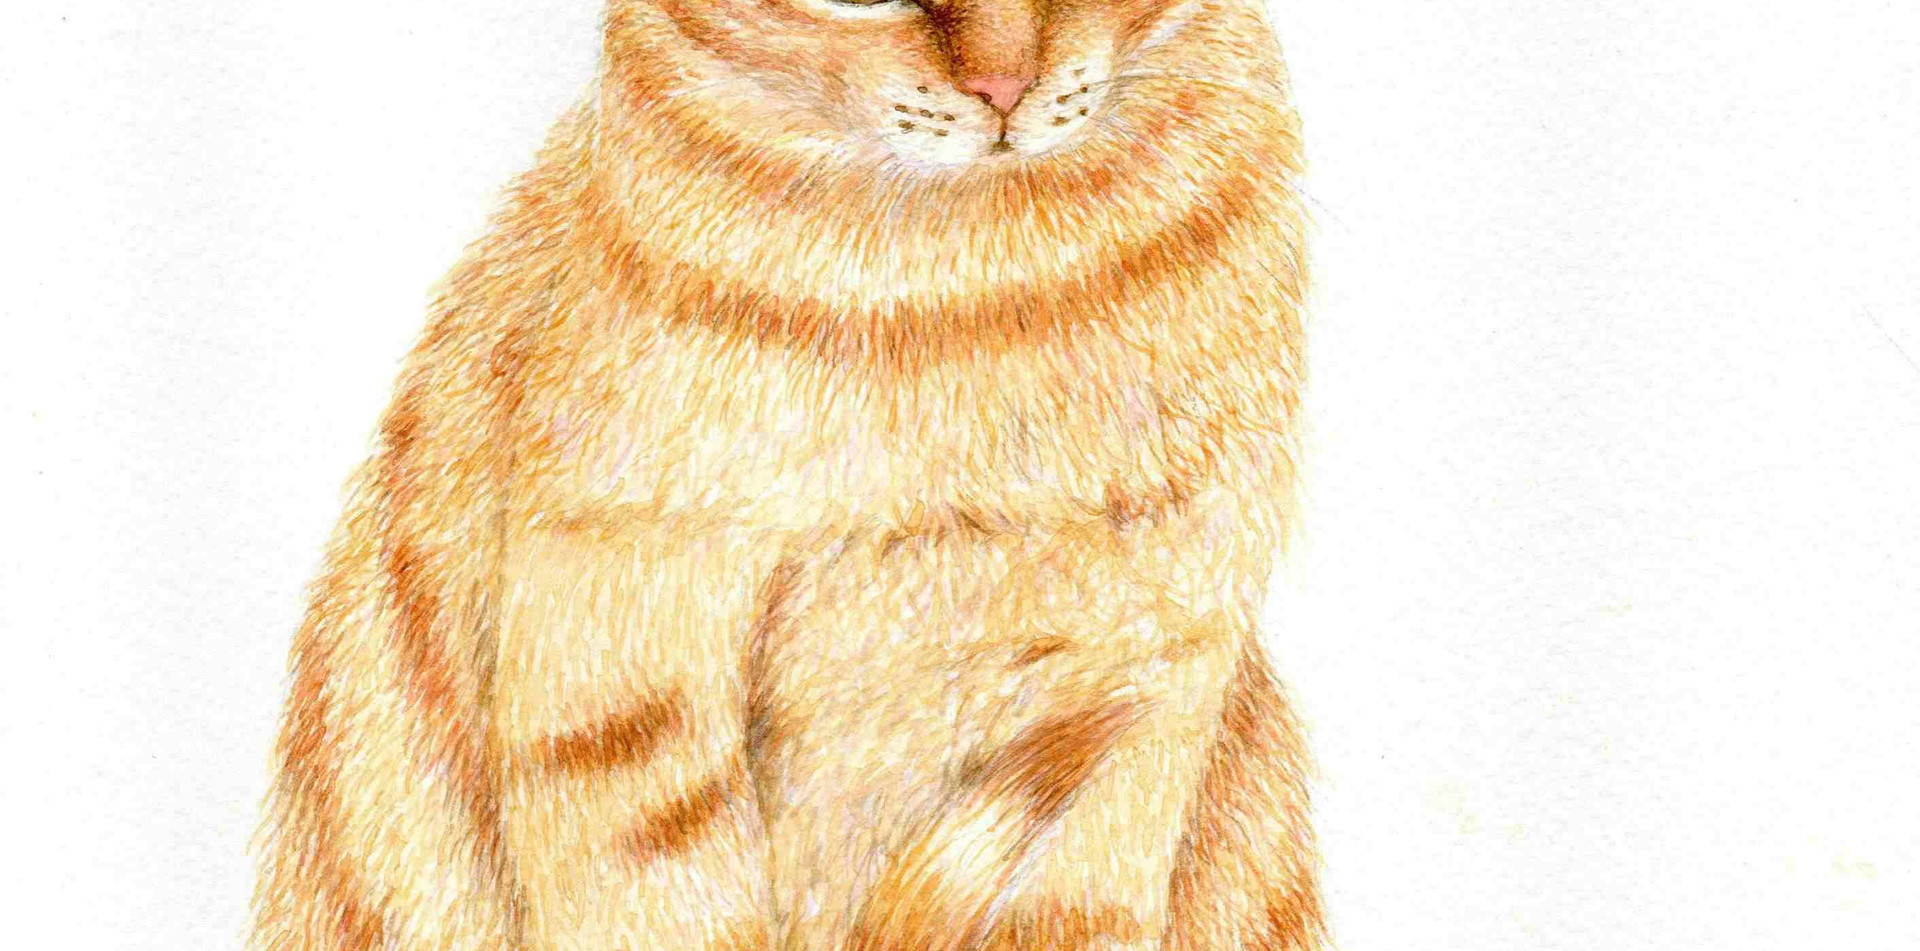 515 - A Ginger Tabby Cat